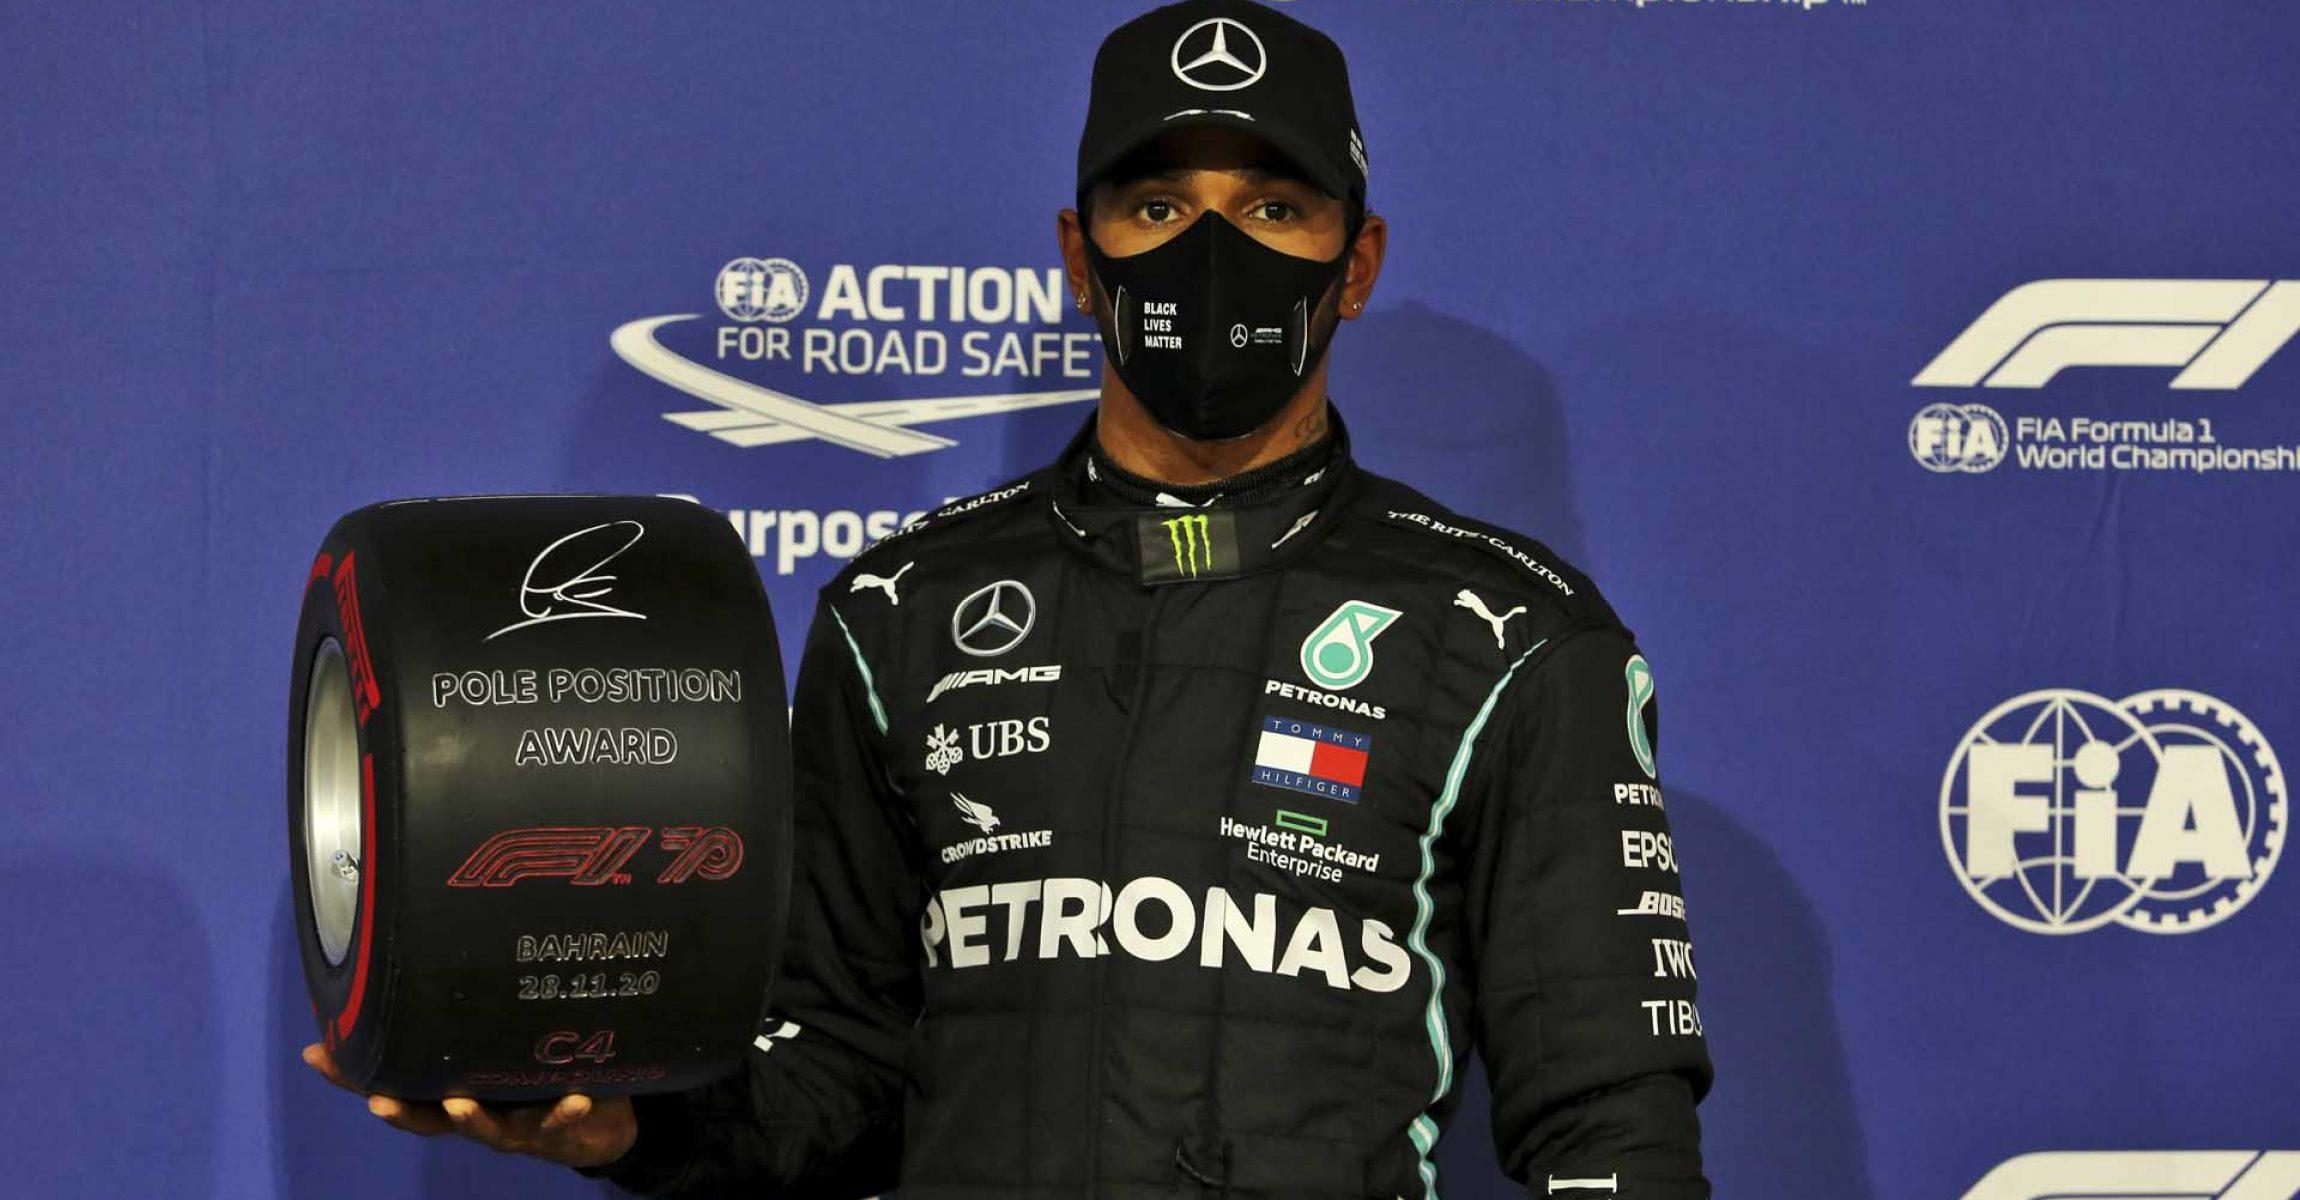 2020 Bahrain Grand Prix, Saturday - LAT Images Lewis Hamilton Mercedes Pole Position Award